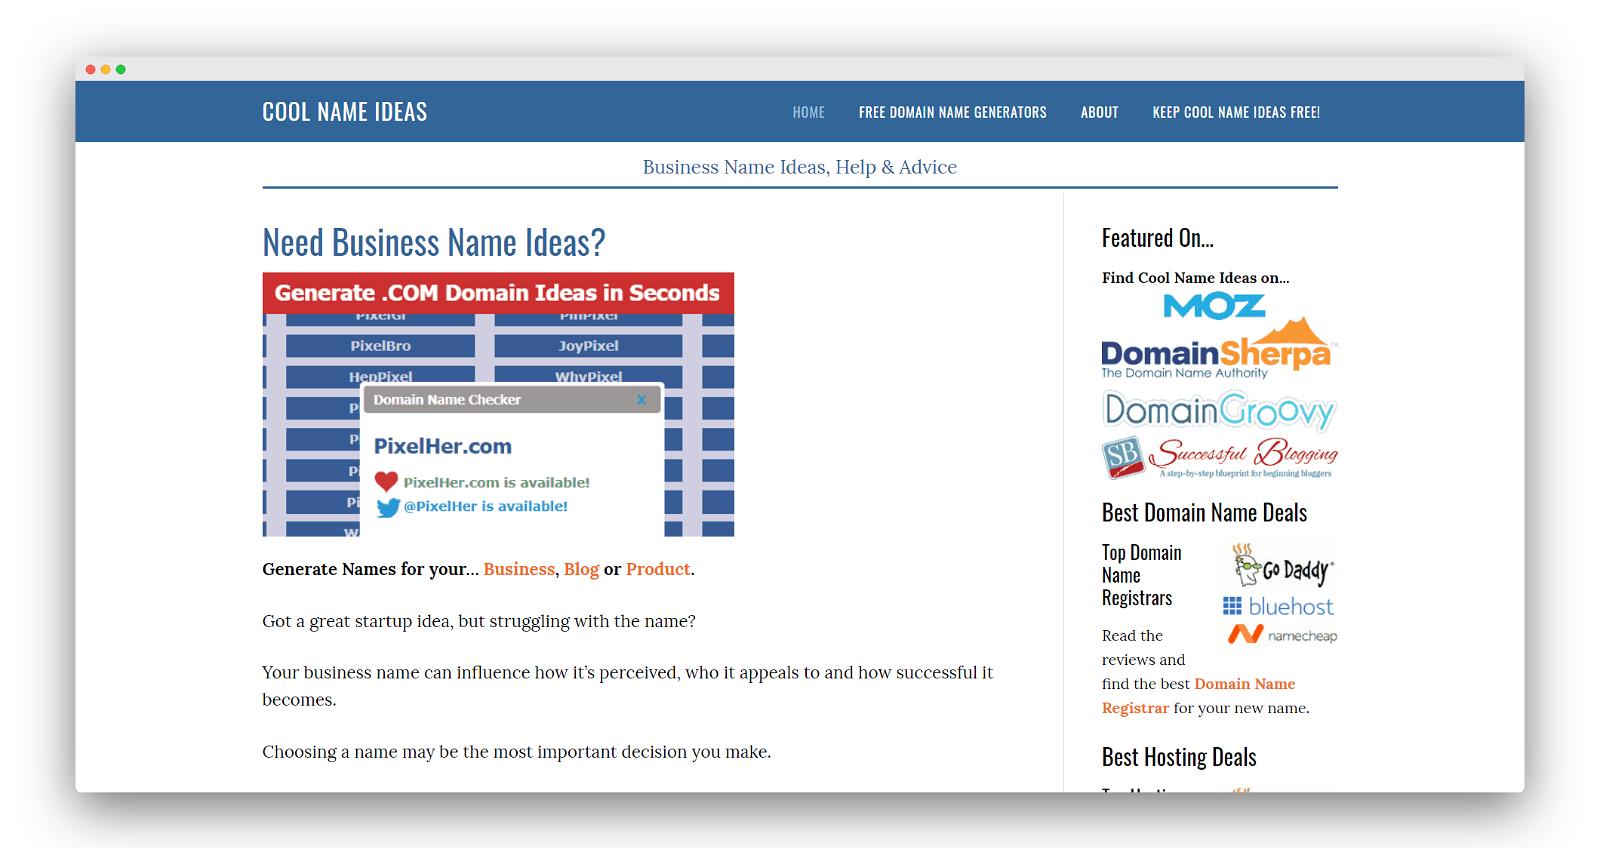 Cool Name Ideas Screenshot 1